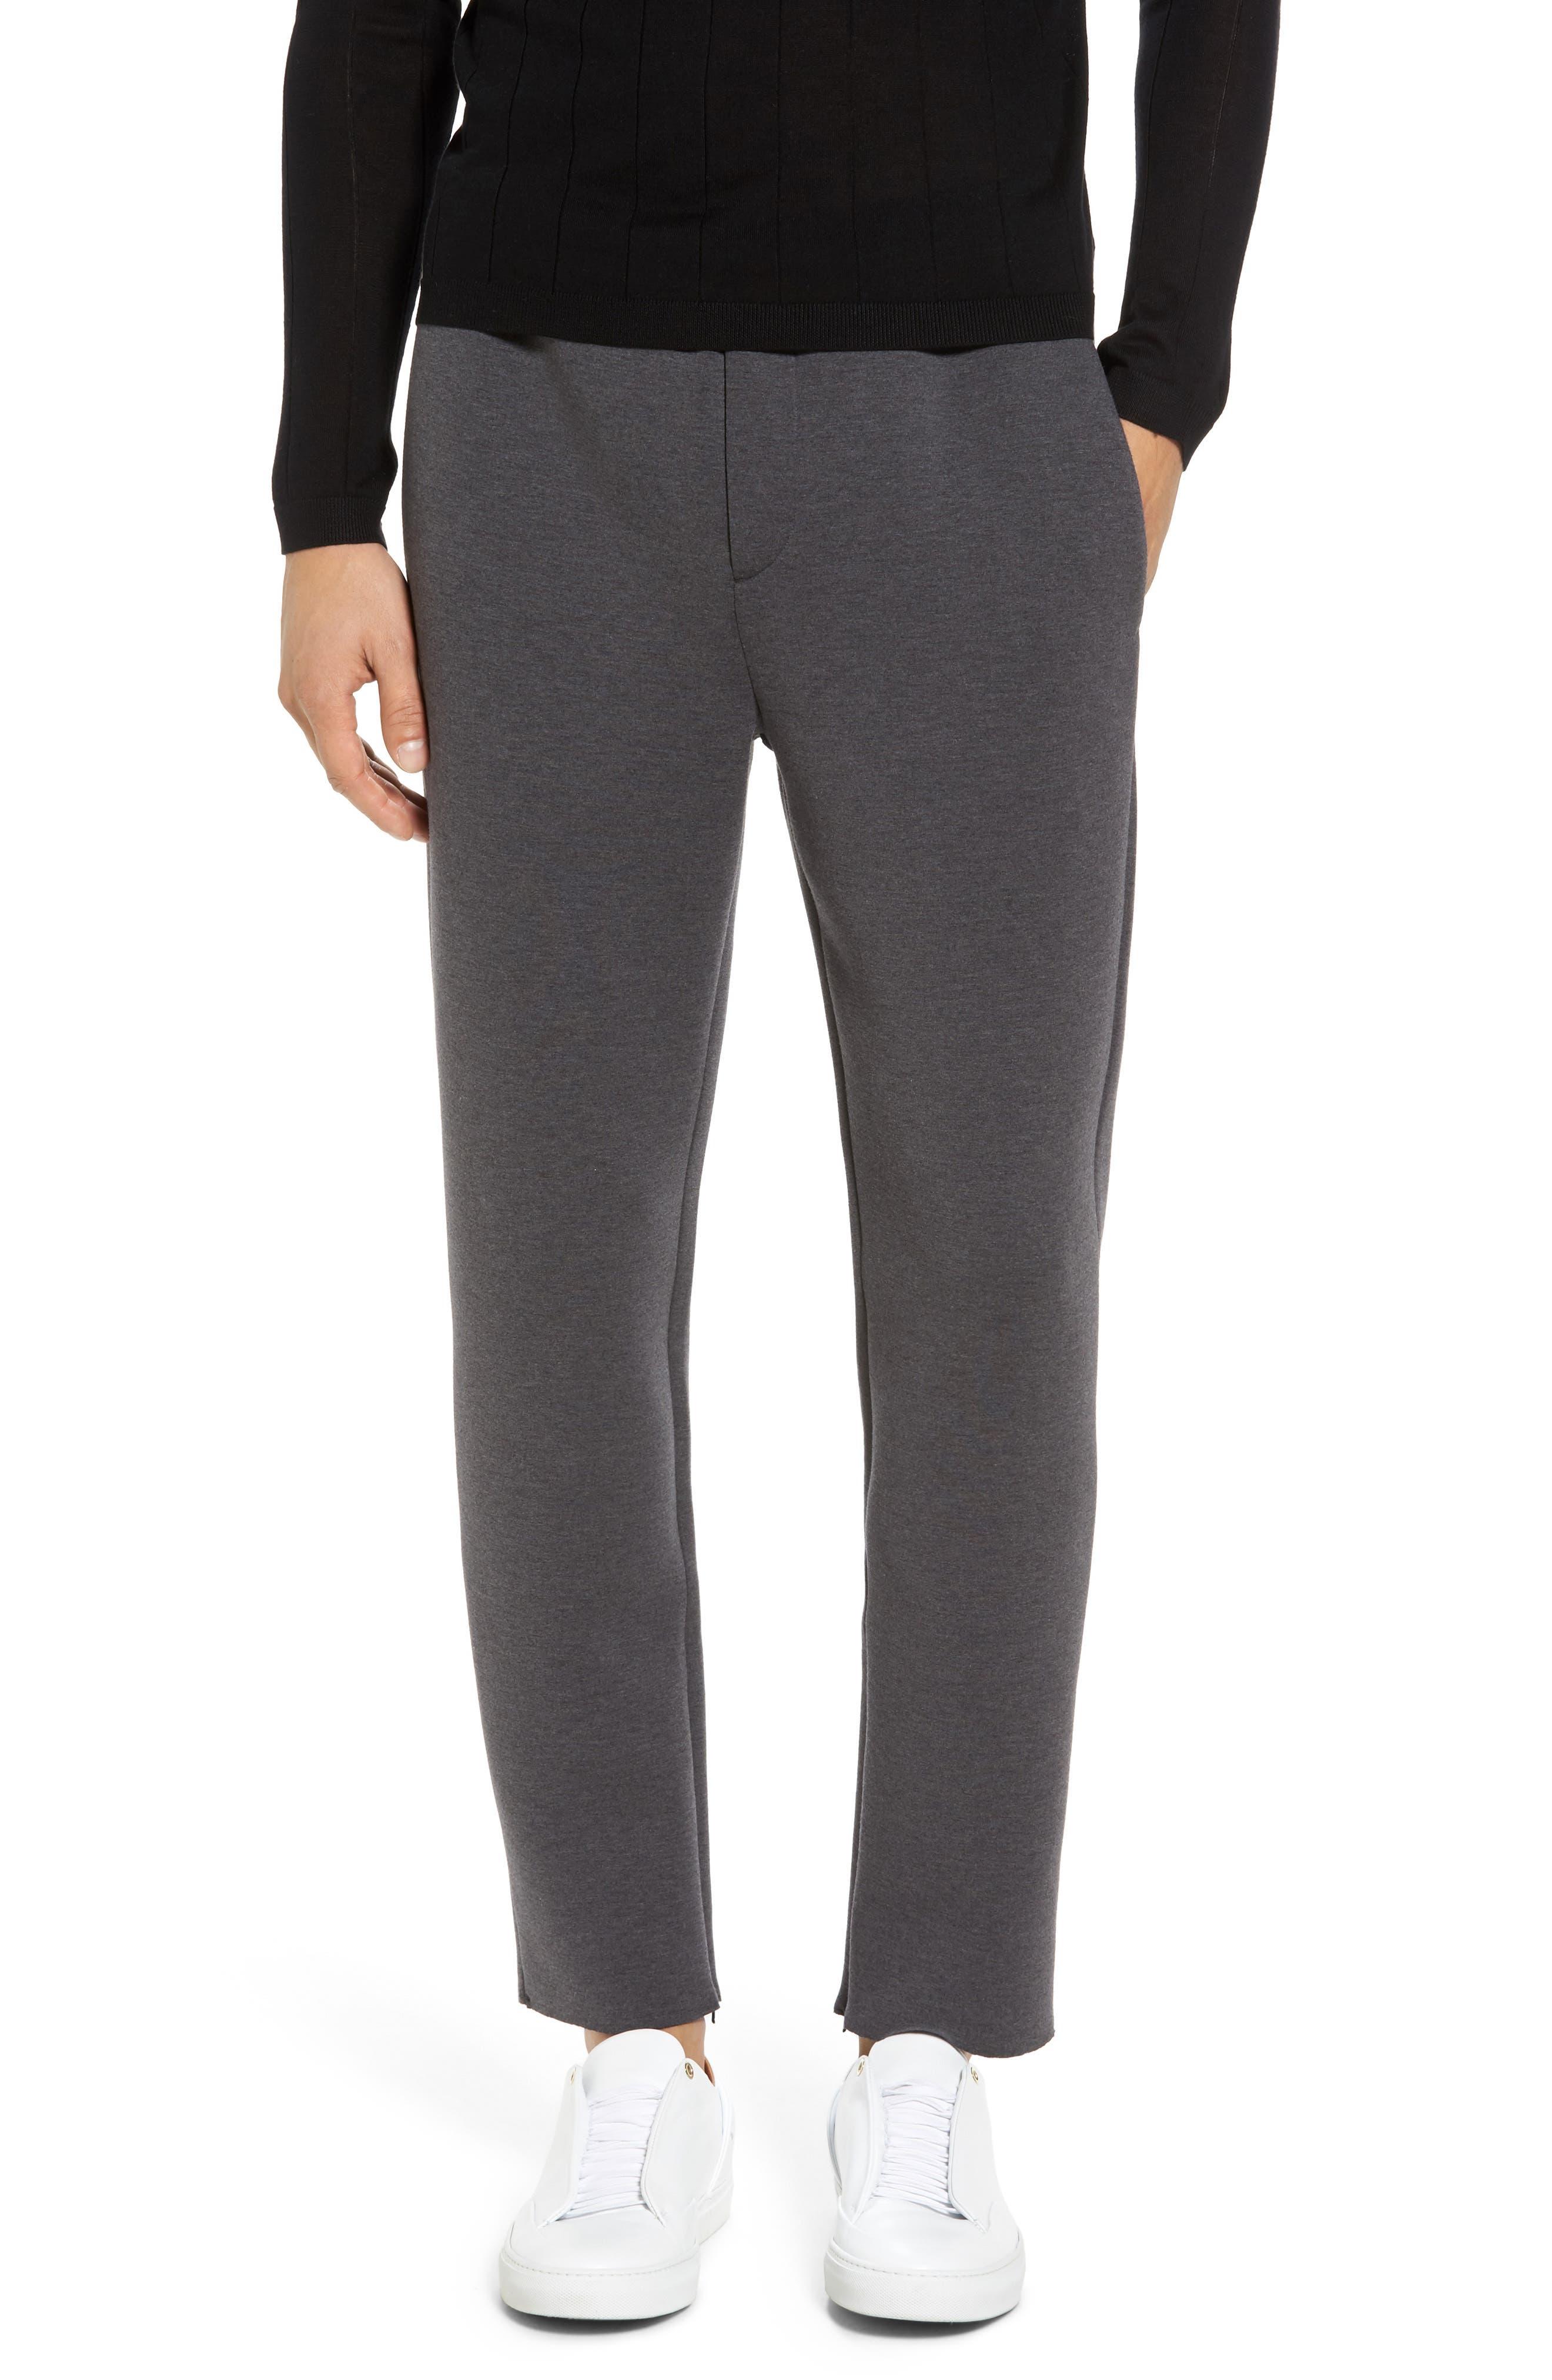 Knit Lounge Pants,                         Main,                         color, Charcoal Heather